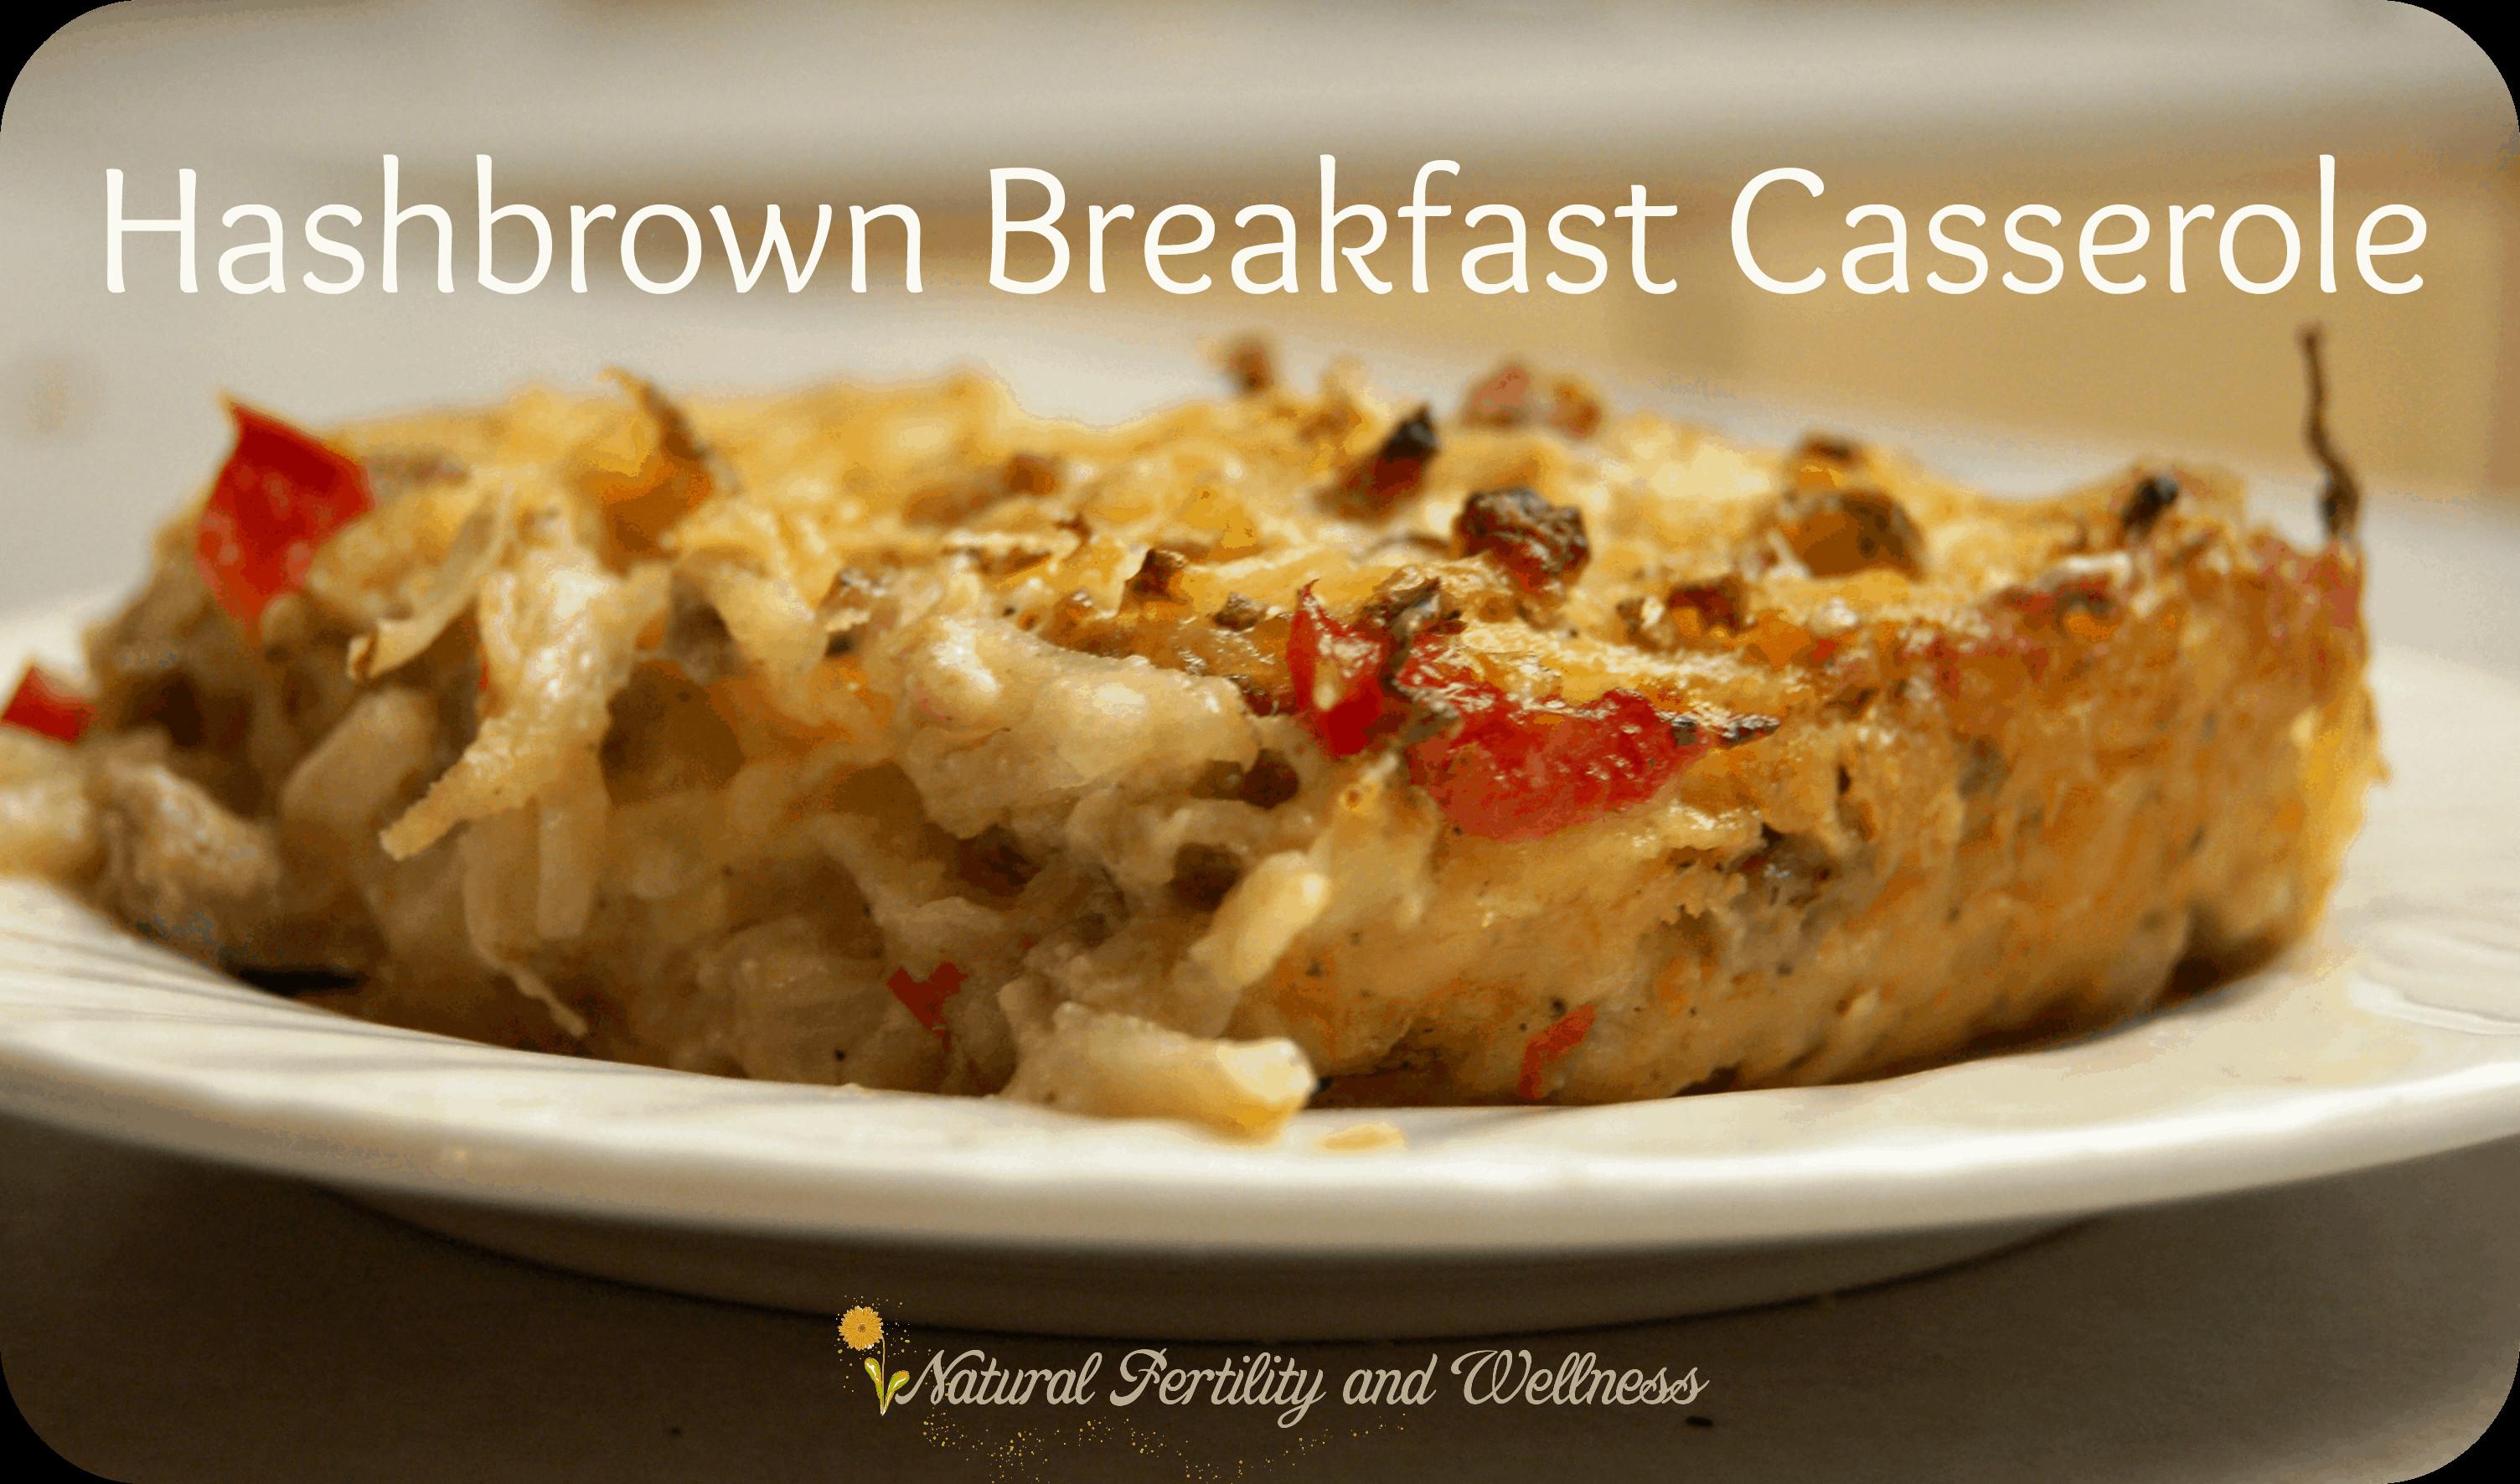 Hashbrown Breakfast Casserole Recipe  Hashbrown Breakfast Casserole